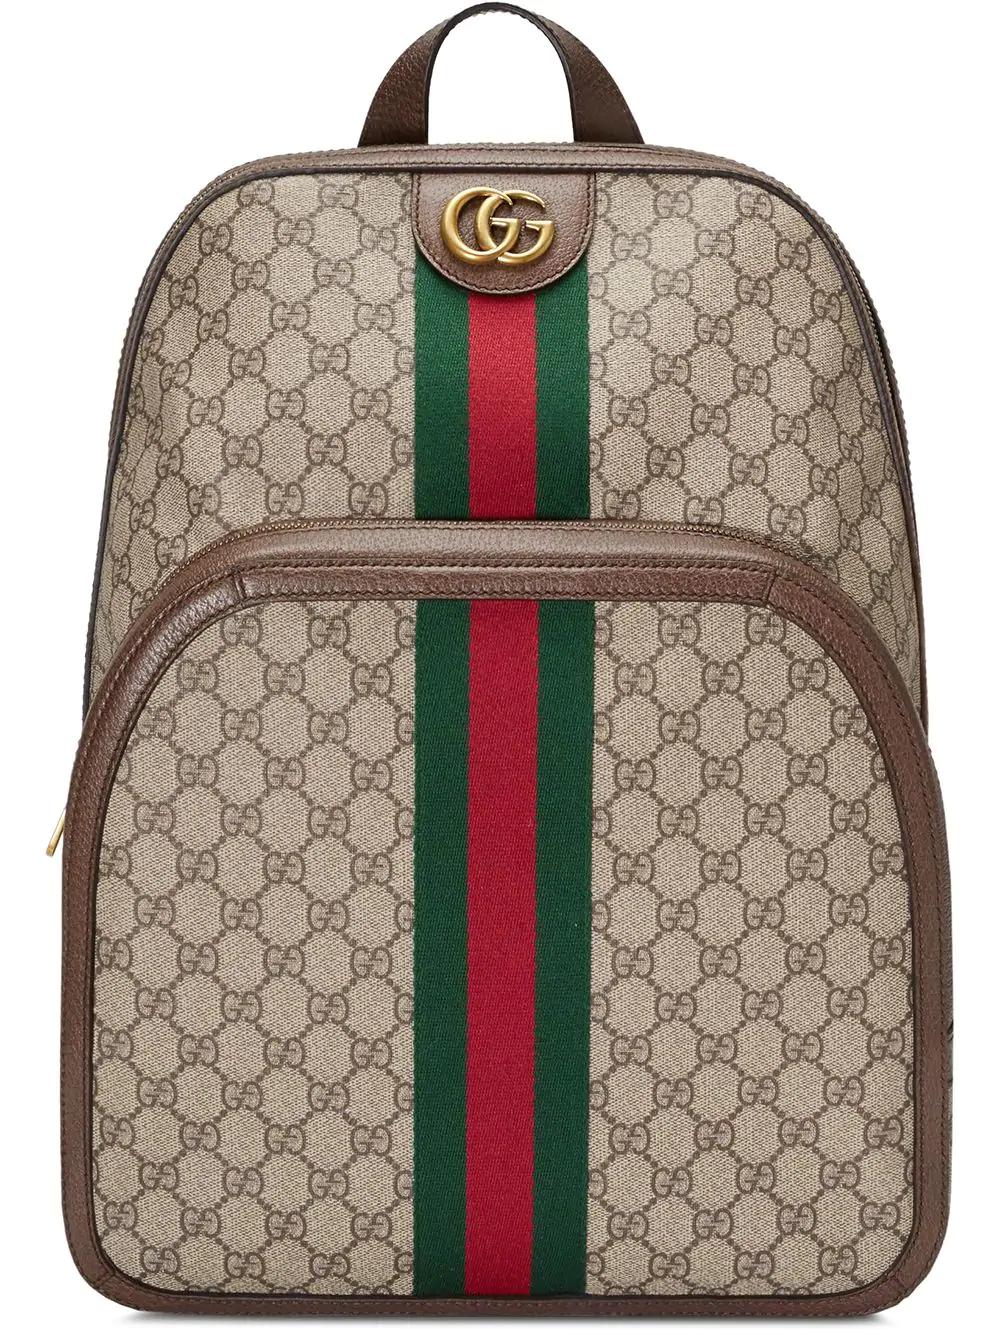 8b51d9f40458 Gucci Men's Gg Supreme Medium Canvas Backpack, Beige In Brown | ModeSens